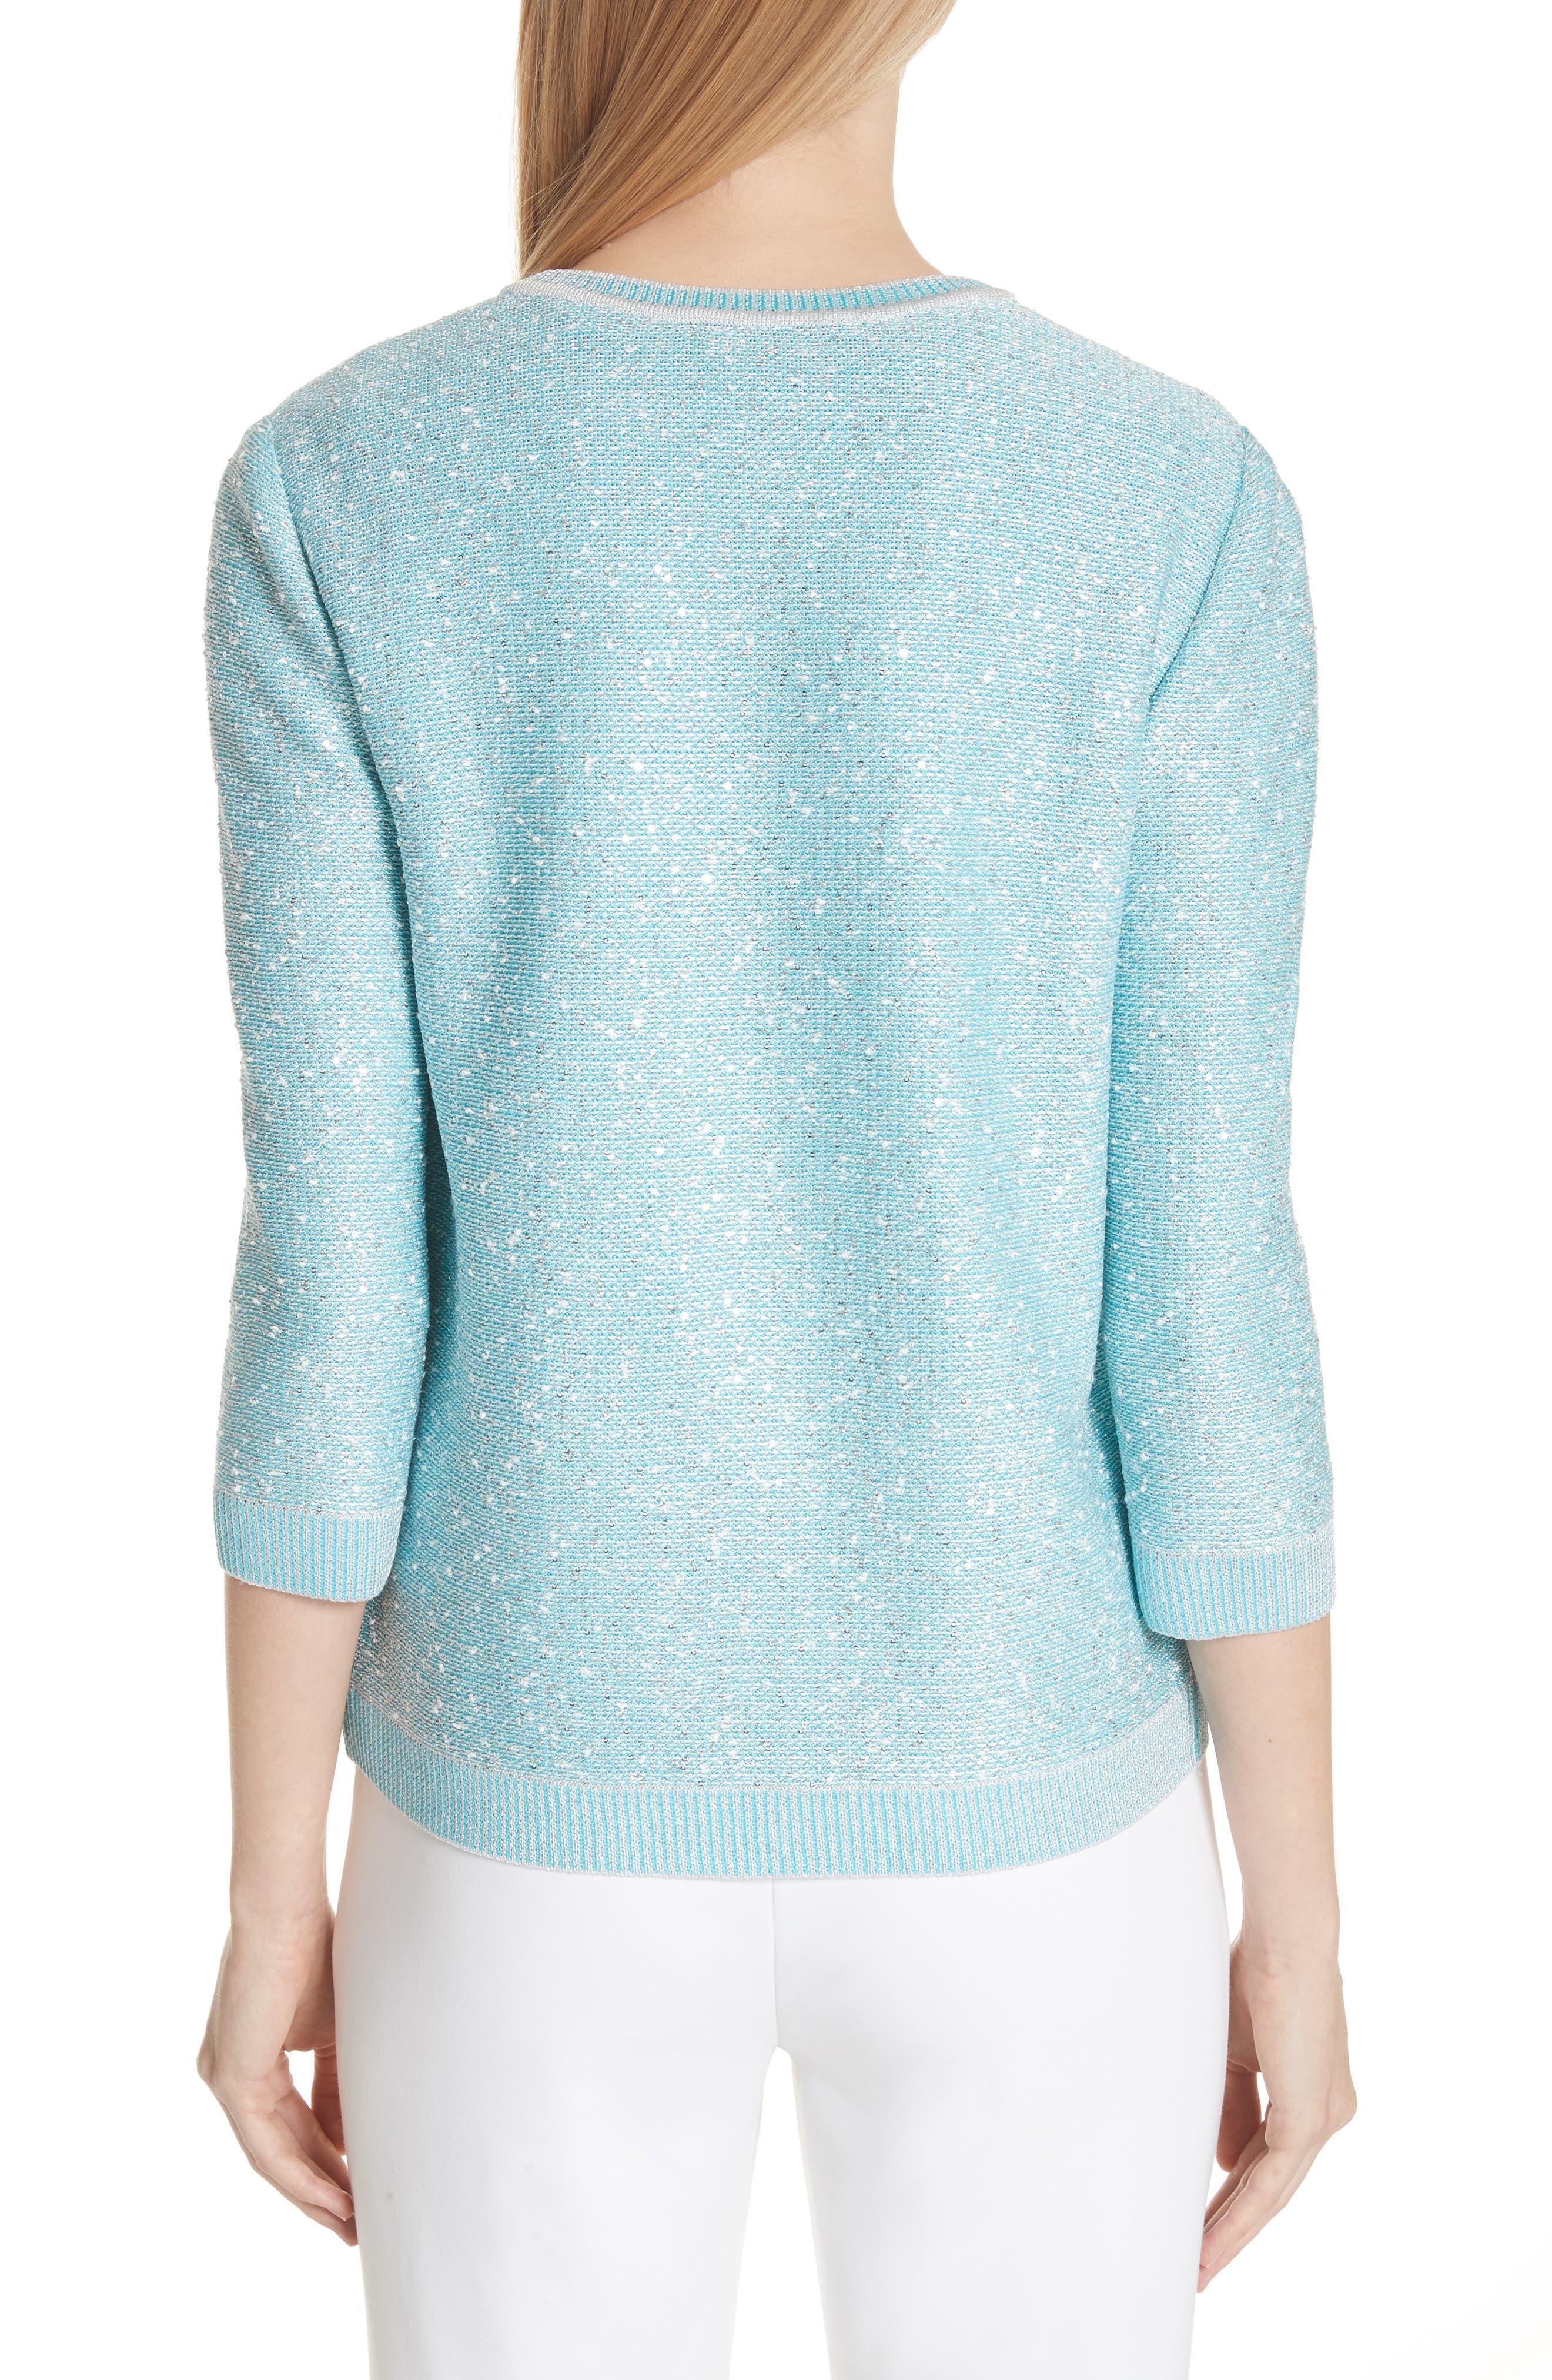 Flecked Sparkle Knit Cardigan,                             Alternate thumbnail 2, color,                             400